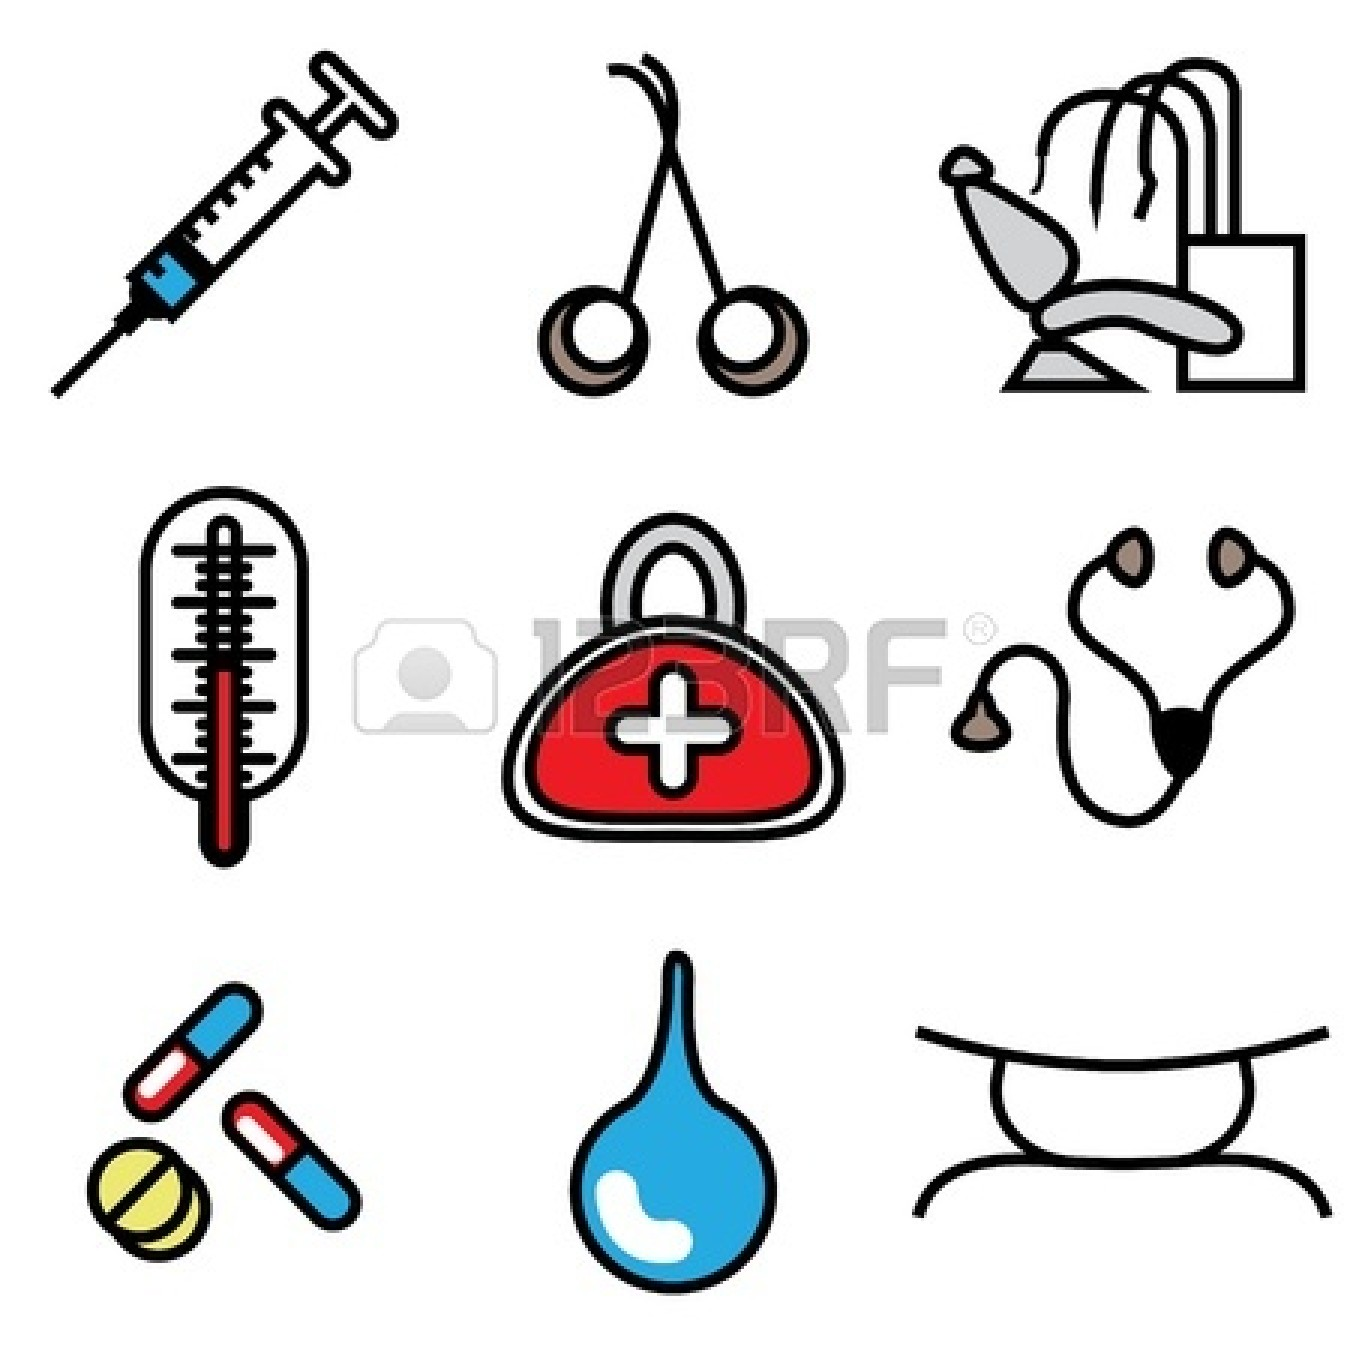 Veterinarian clipart veterinarian tool. Doctor tools free download